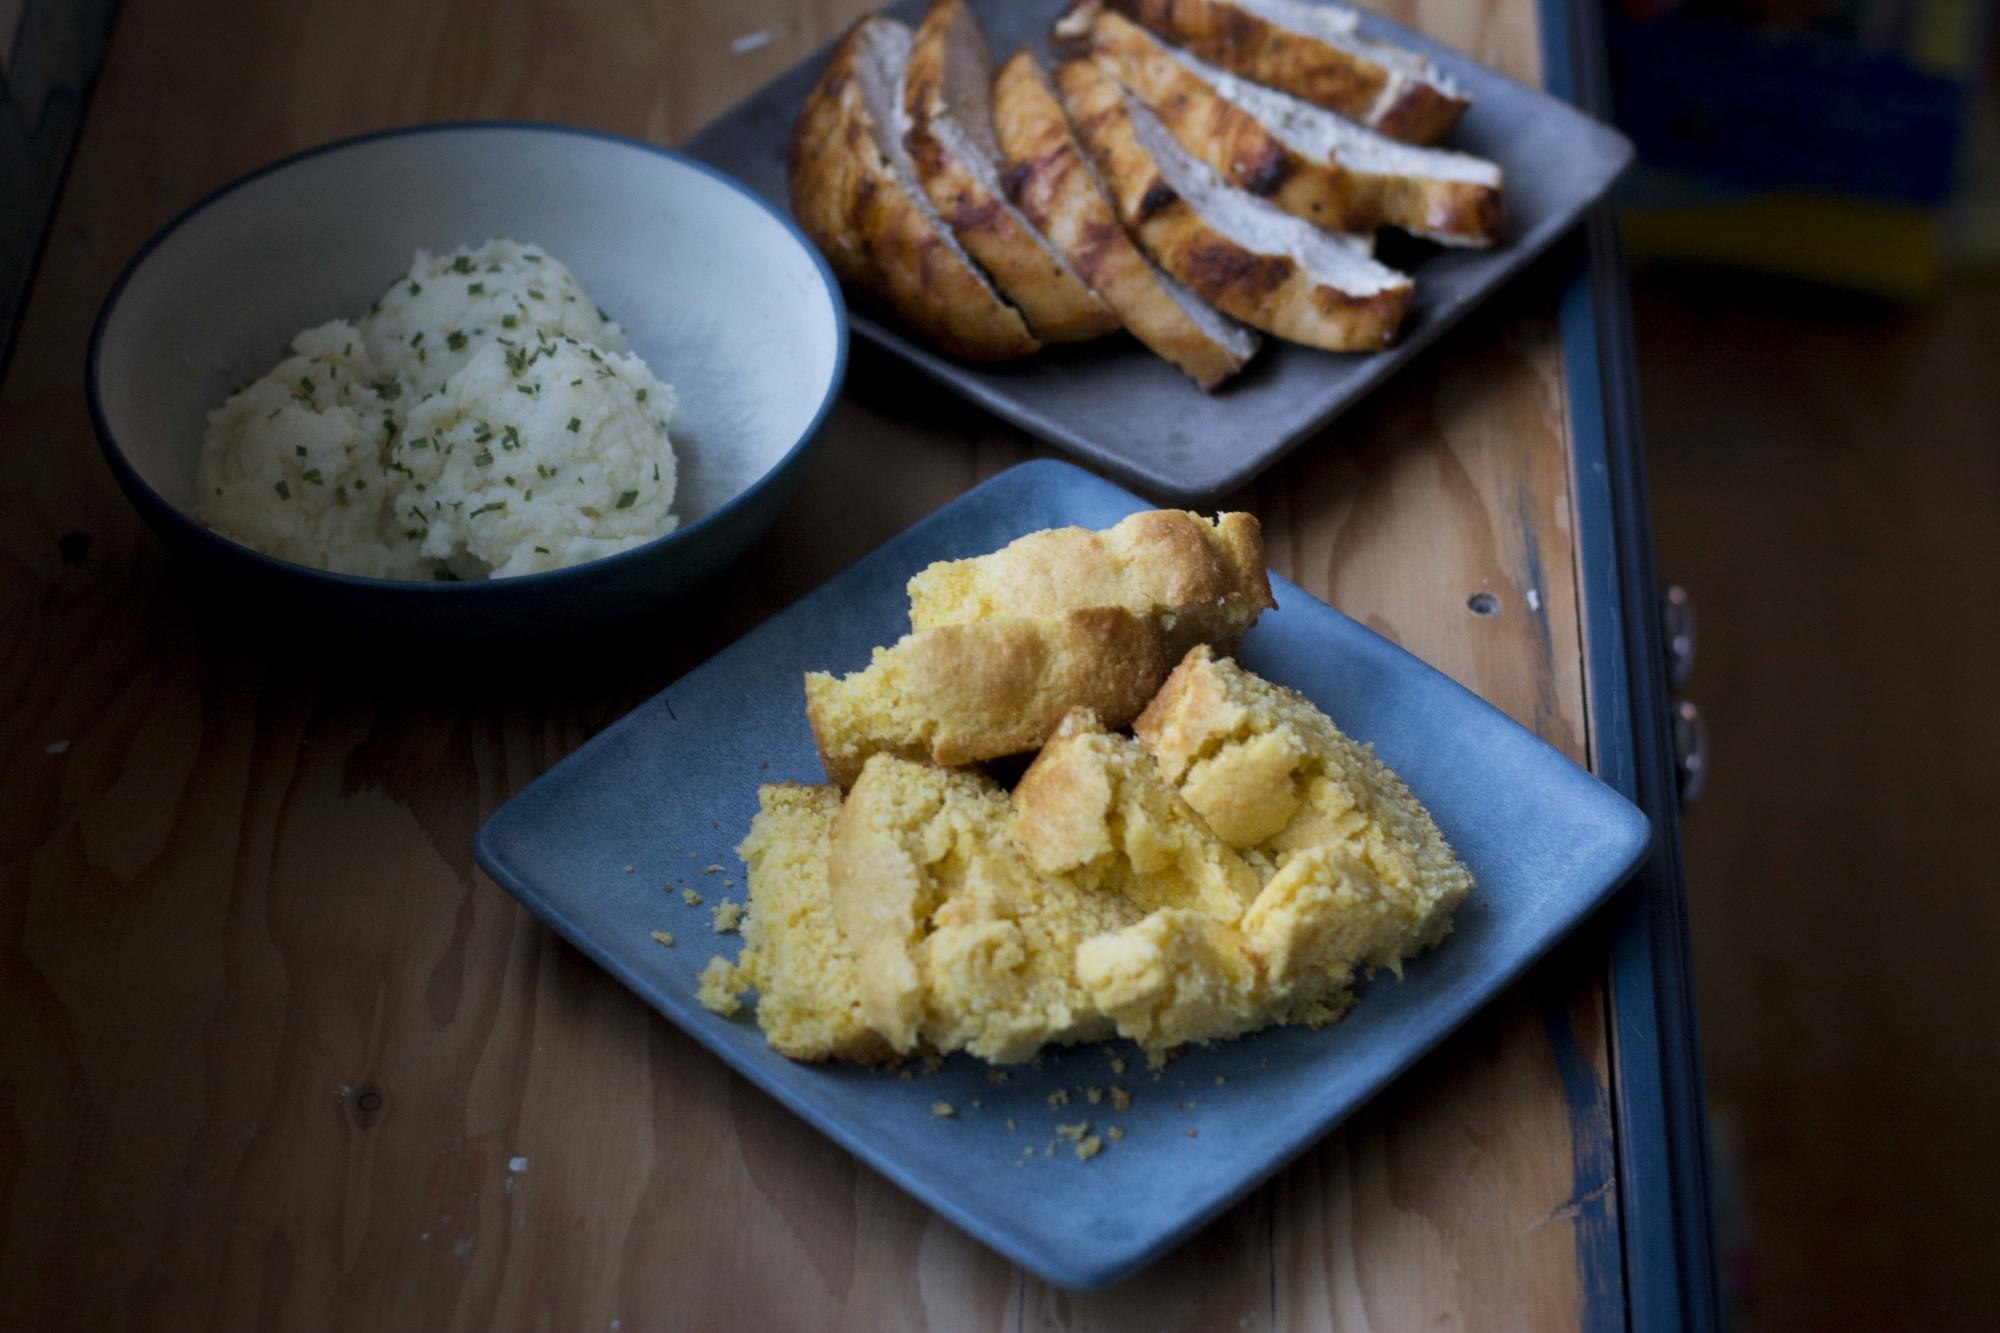 Cornbread, turkey and mashed potatoes.